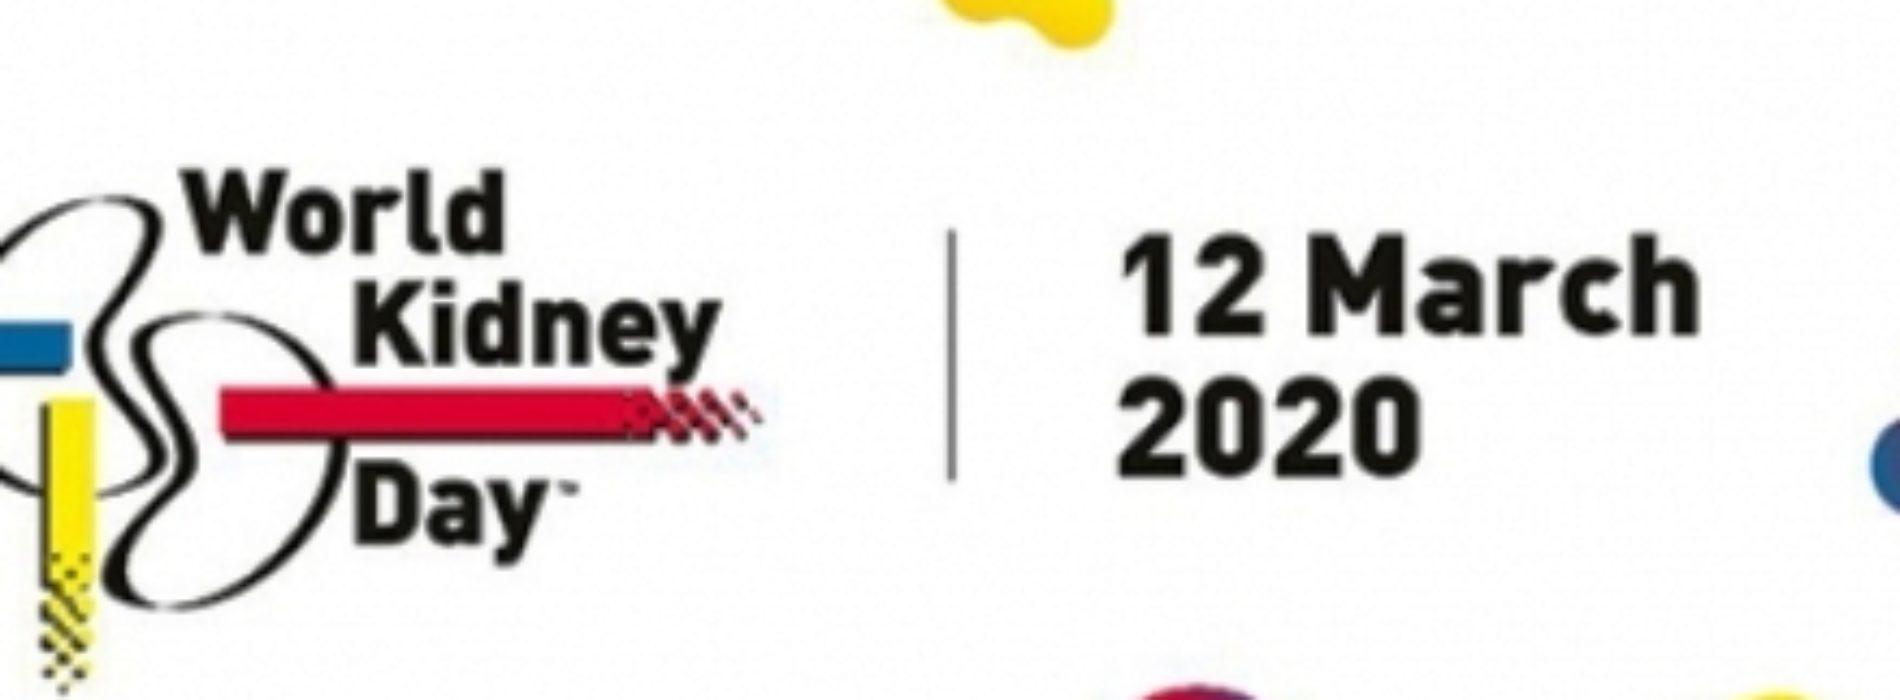 World Kidney Day 2020: Prevention remains best option